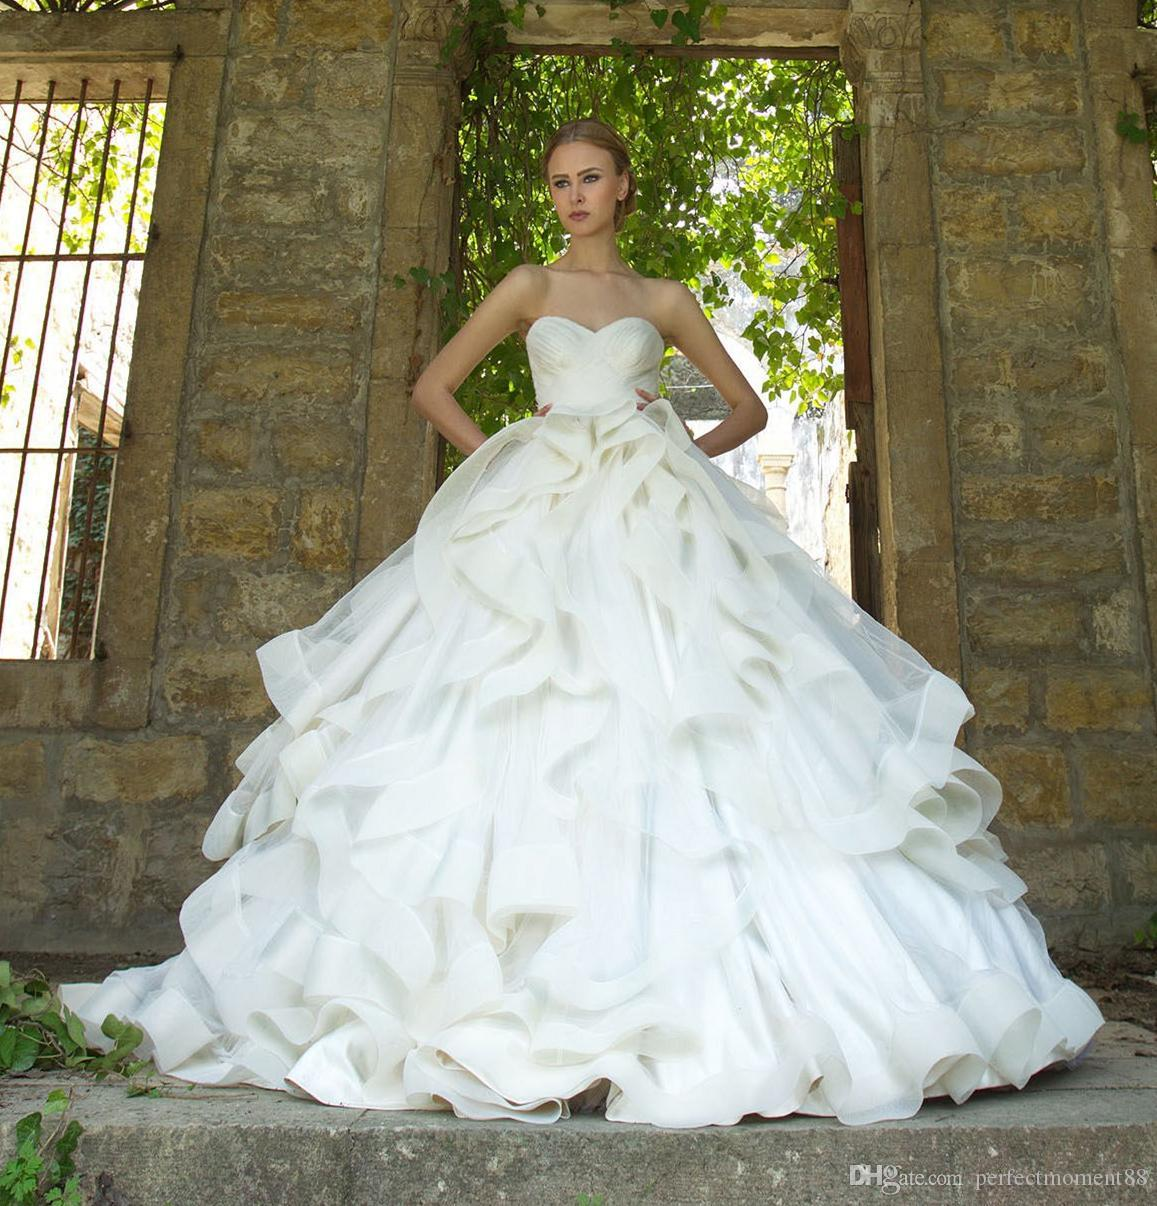 2017 pnina tornai ball gown wedding dresses high quality for Pnina tornai wedding dress cost